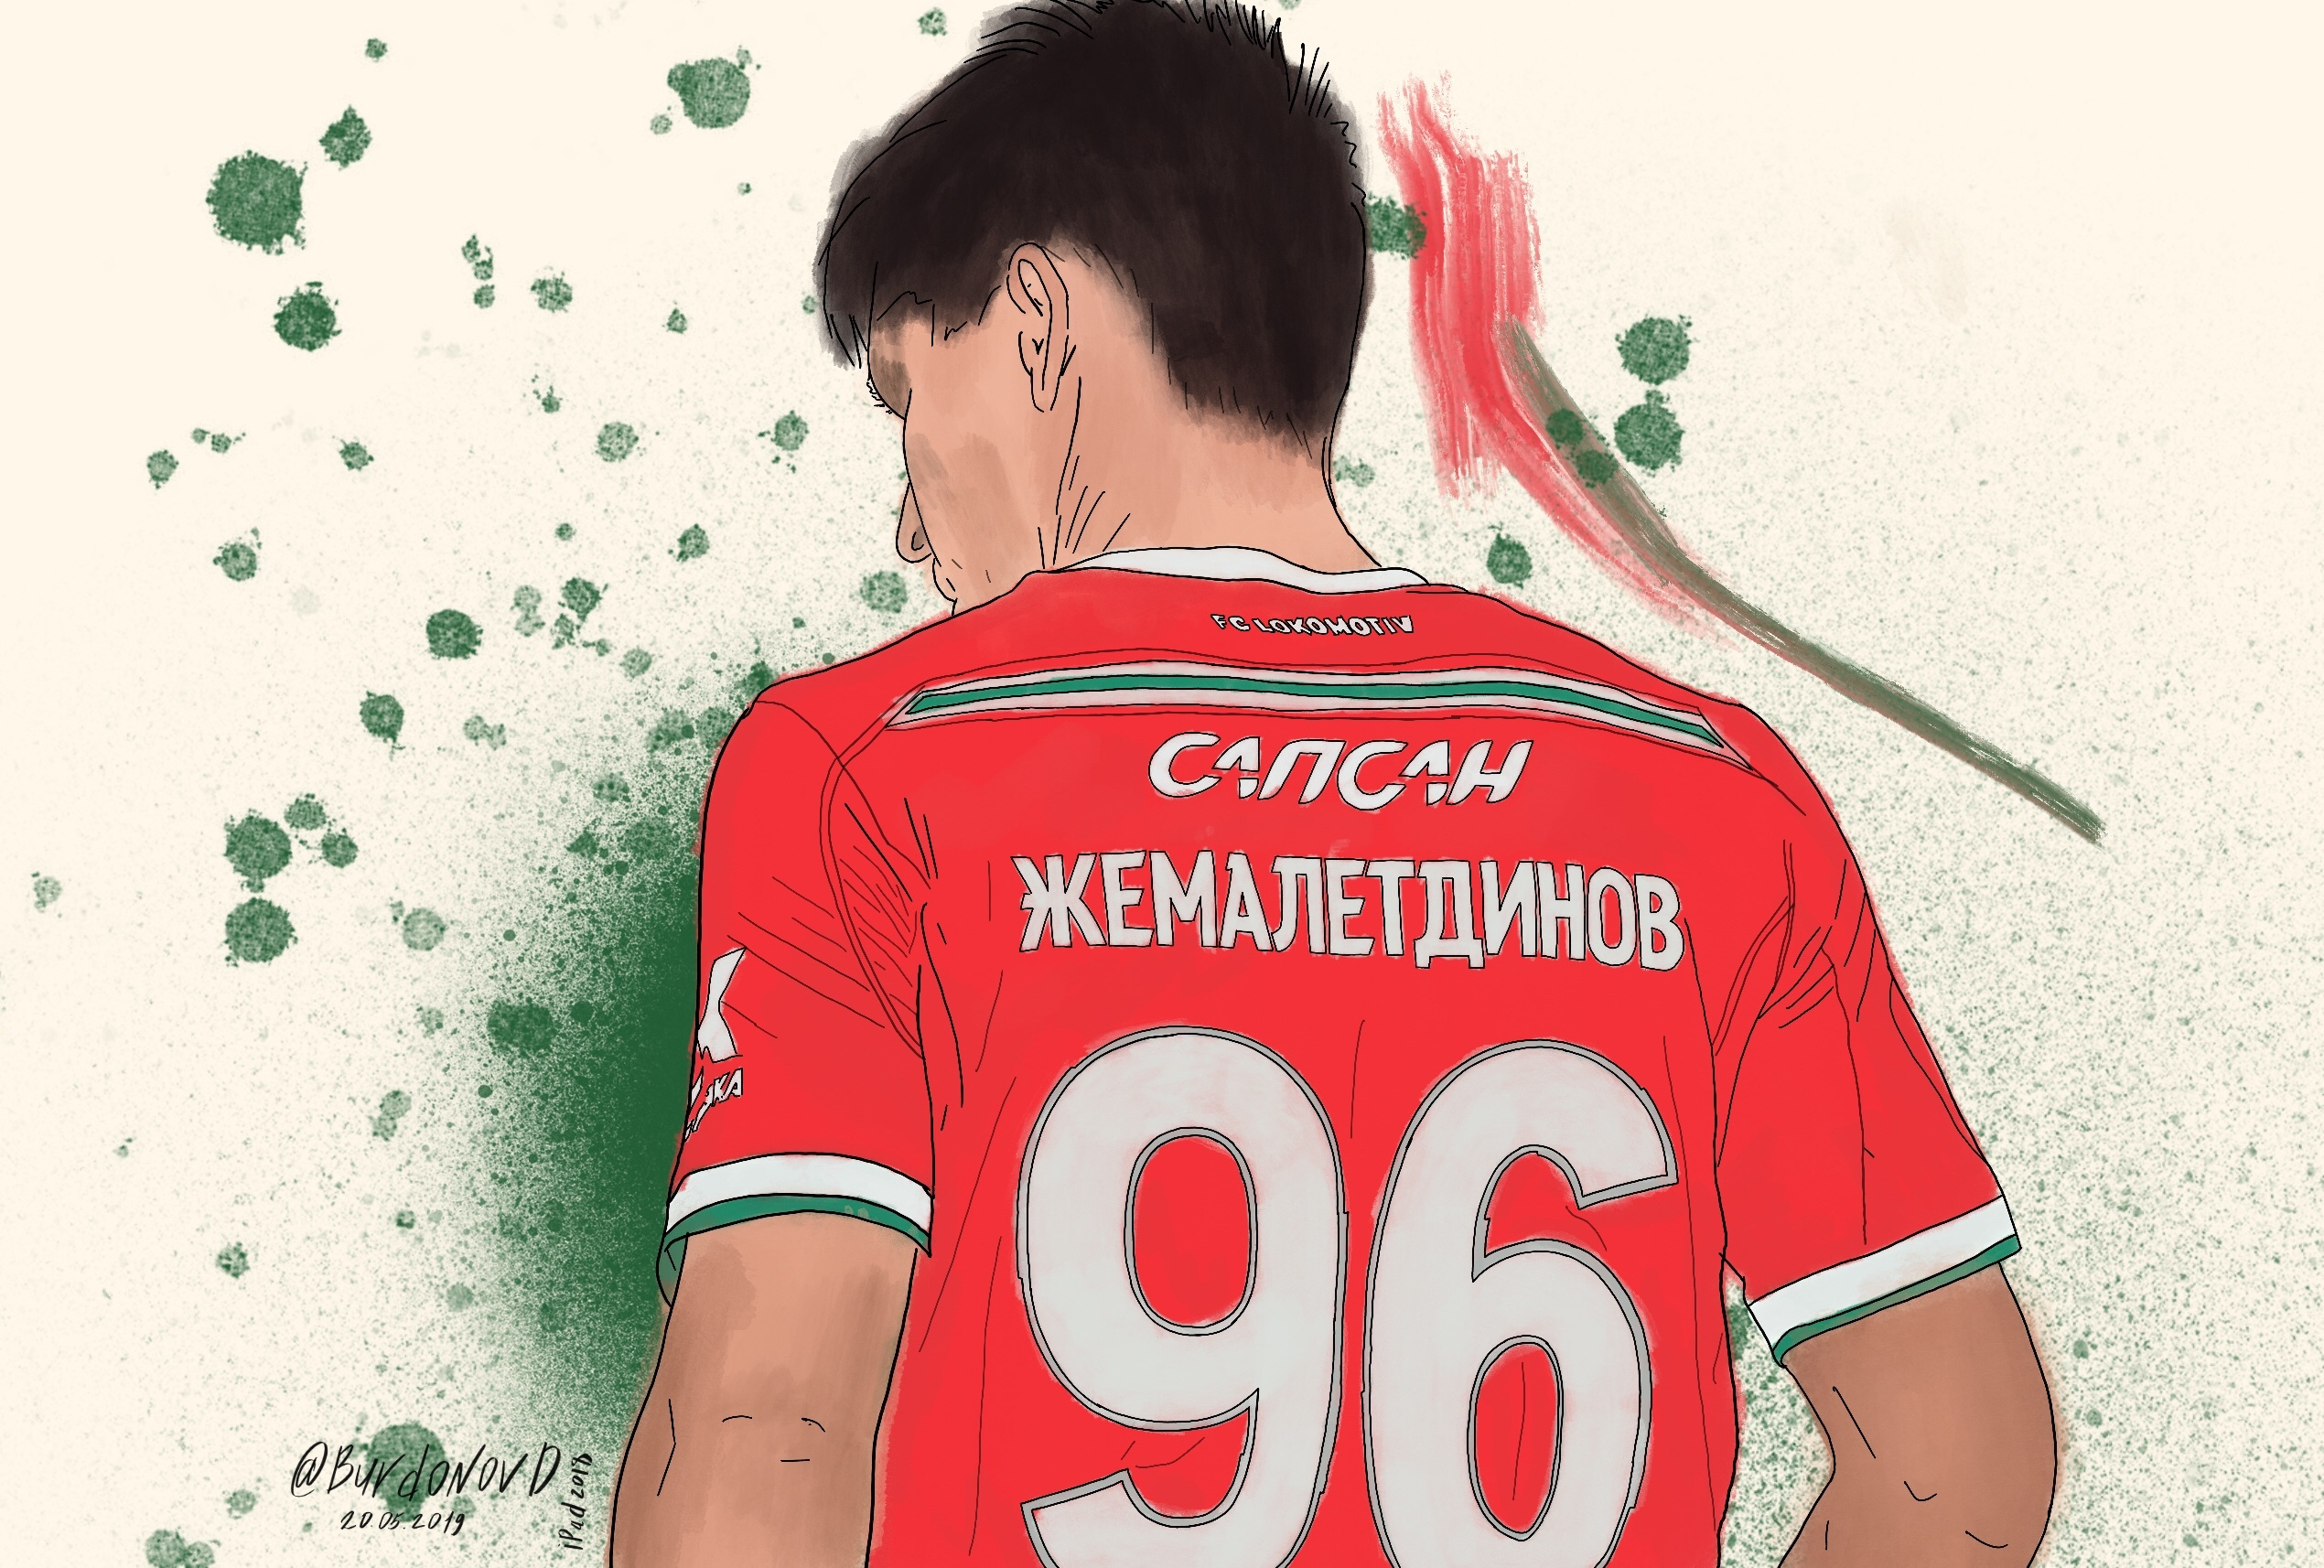 Рифат Жемалетдинов. Рисунок: Дмитрий Бурдонов / Loko.News